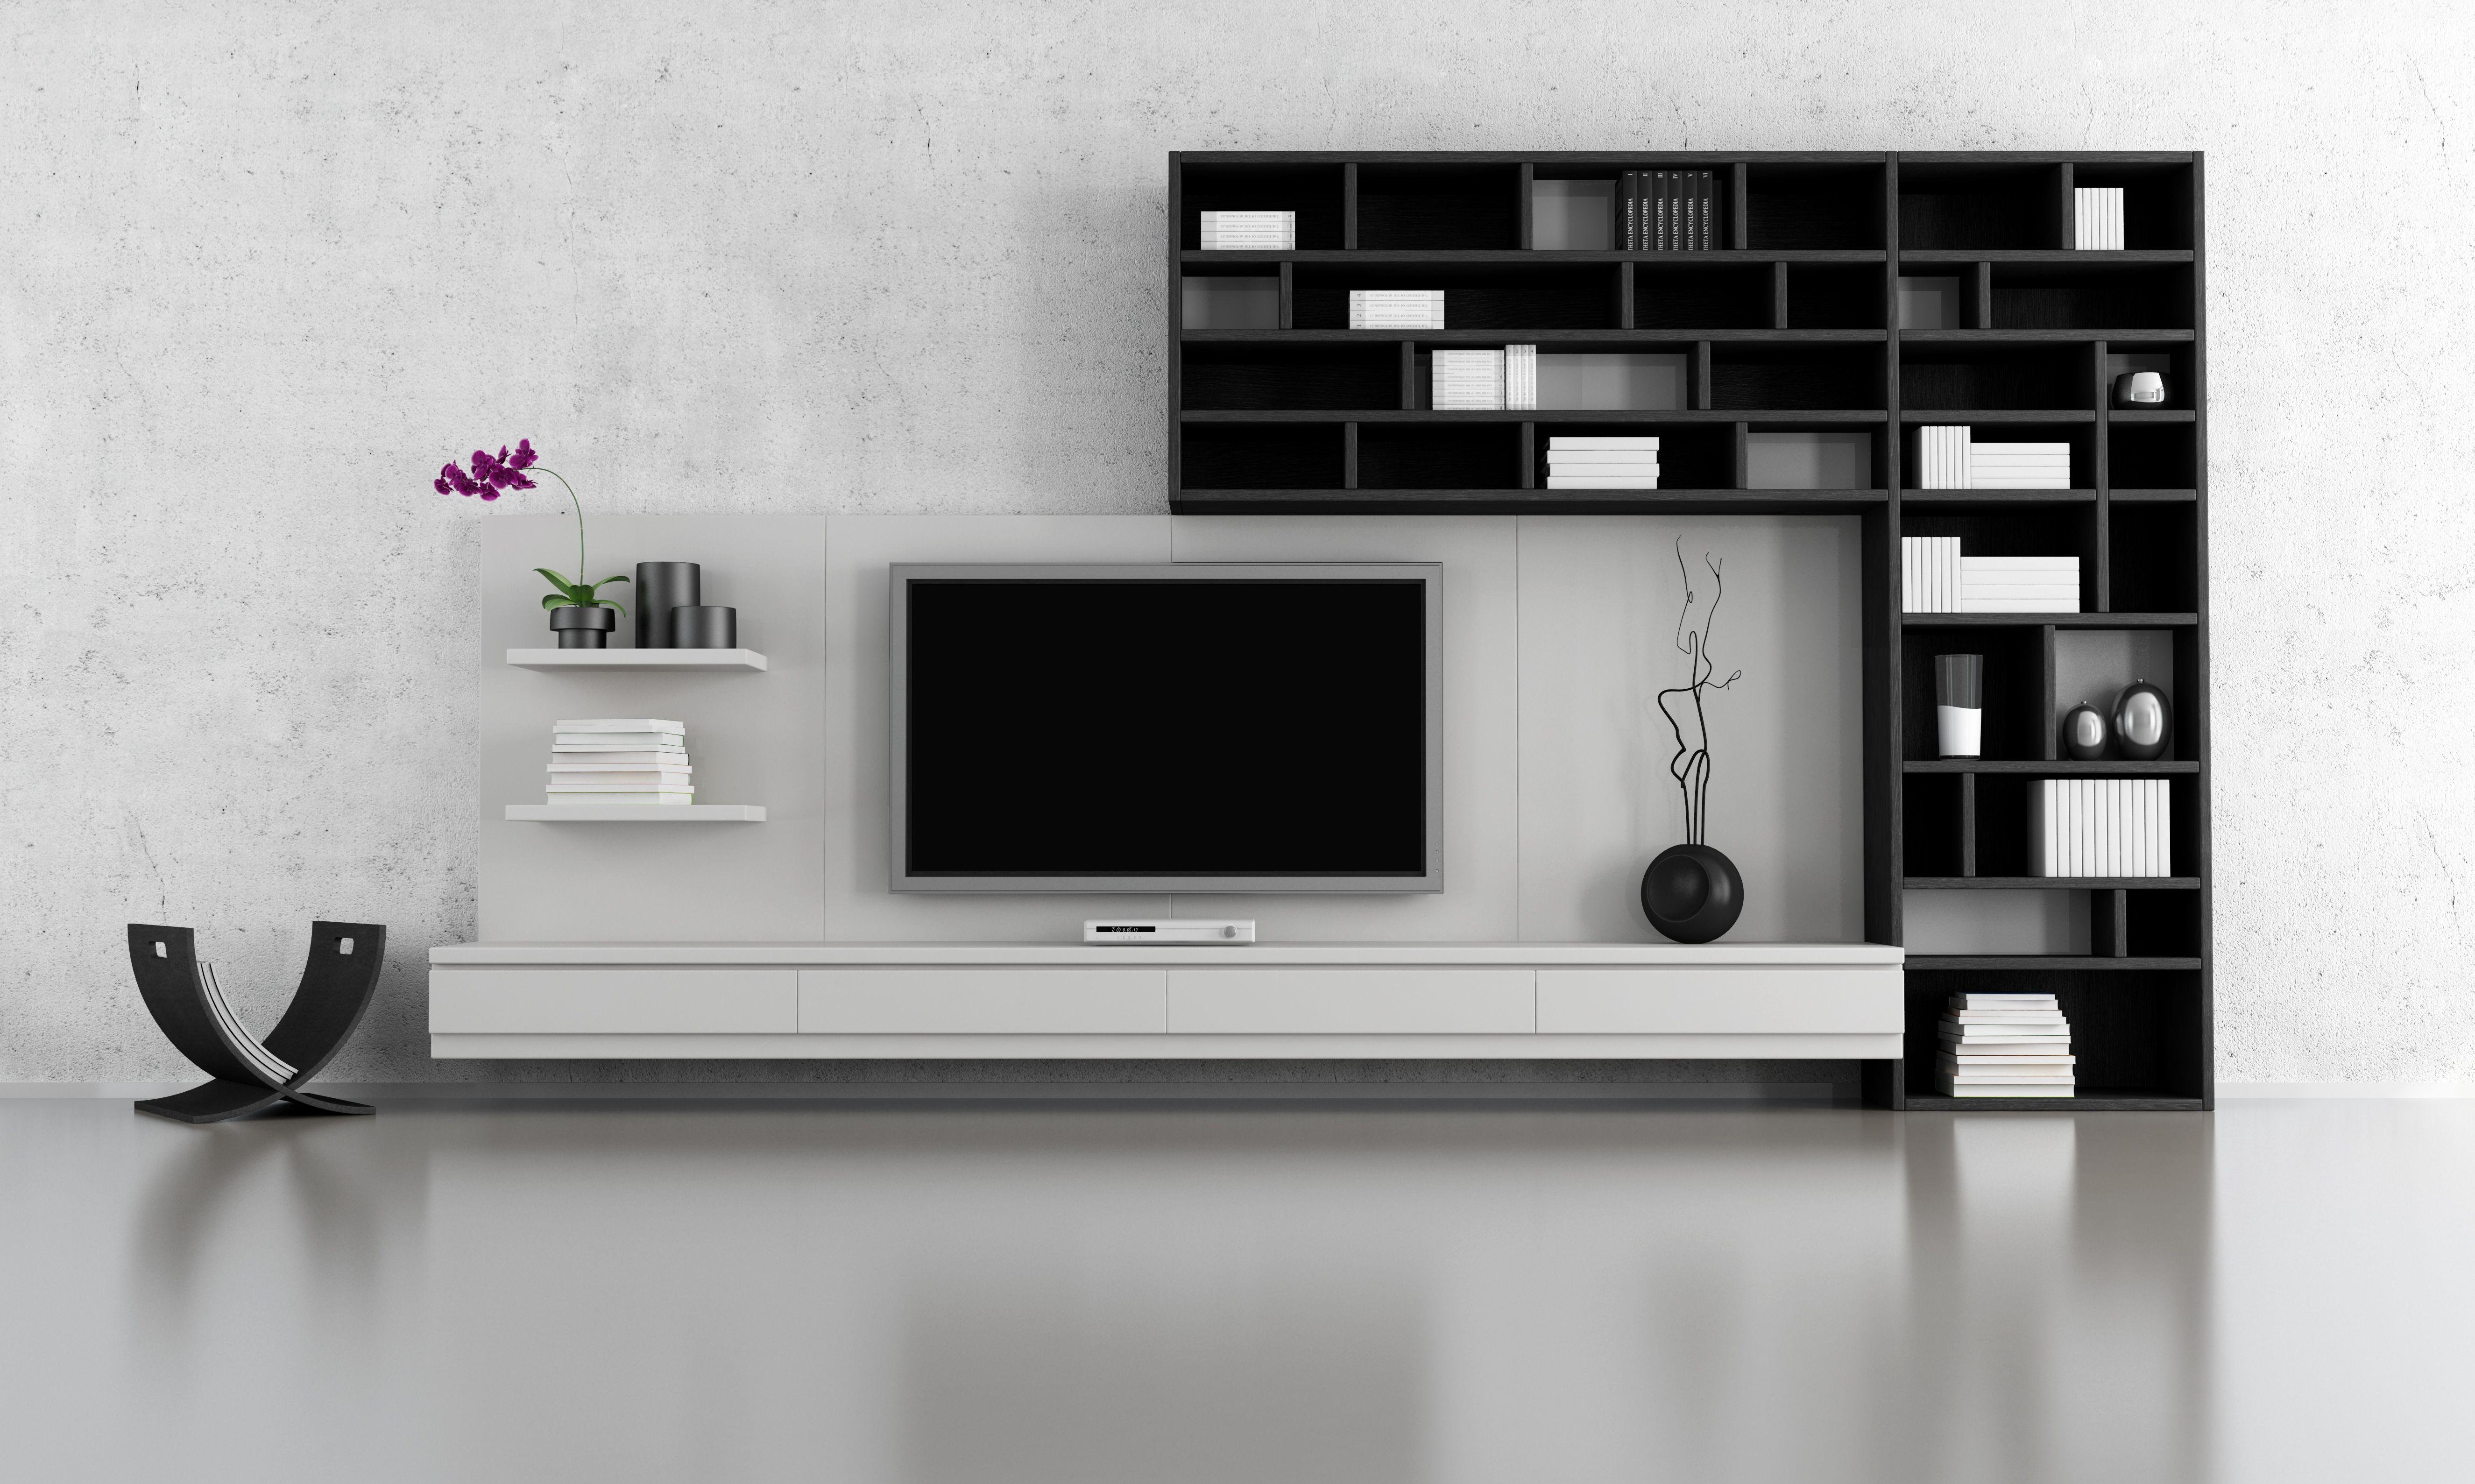 Pin By Homelane On Entertainment Units Pinterest Interiors # Muebles Zb Zaragoza